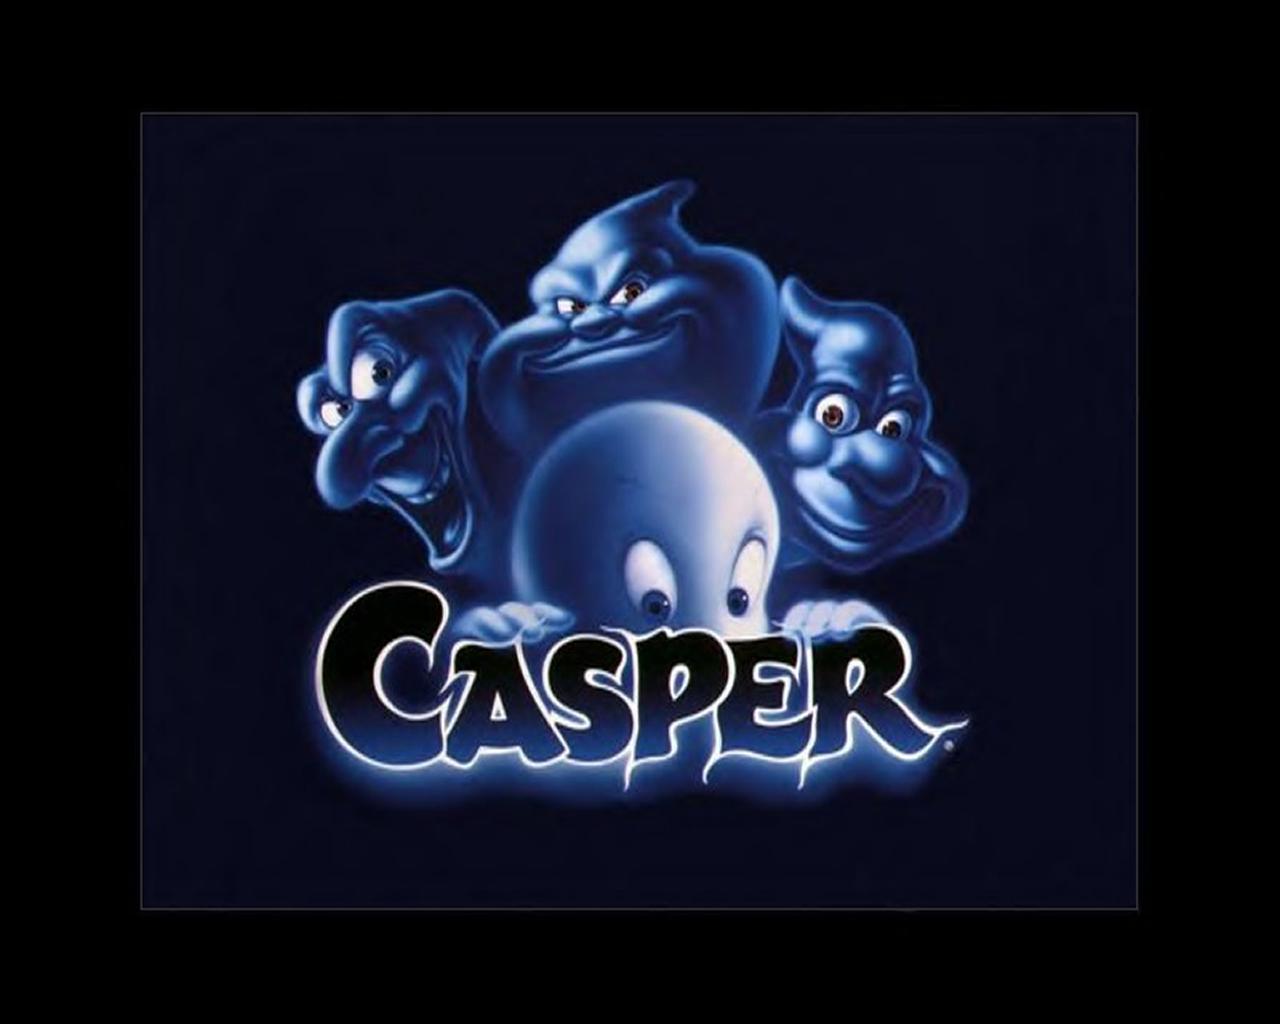 casper-het-vriendelijke-spookje.jpg